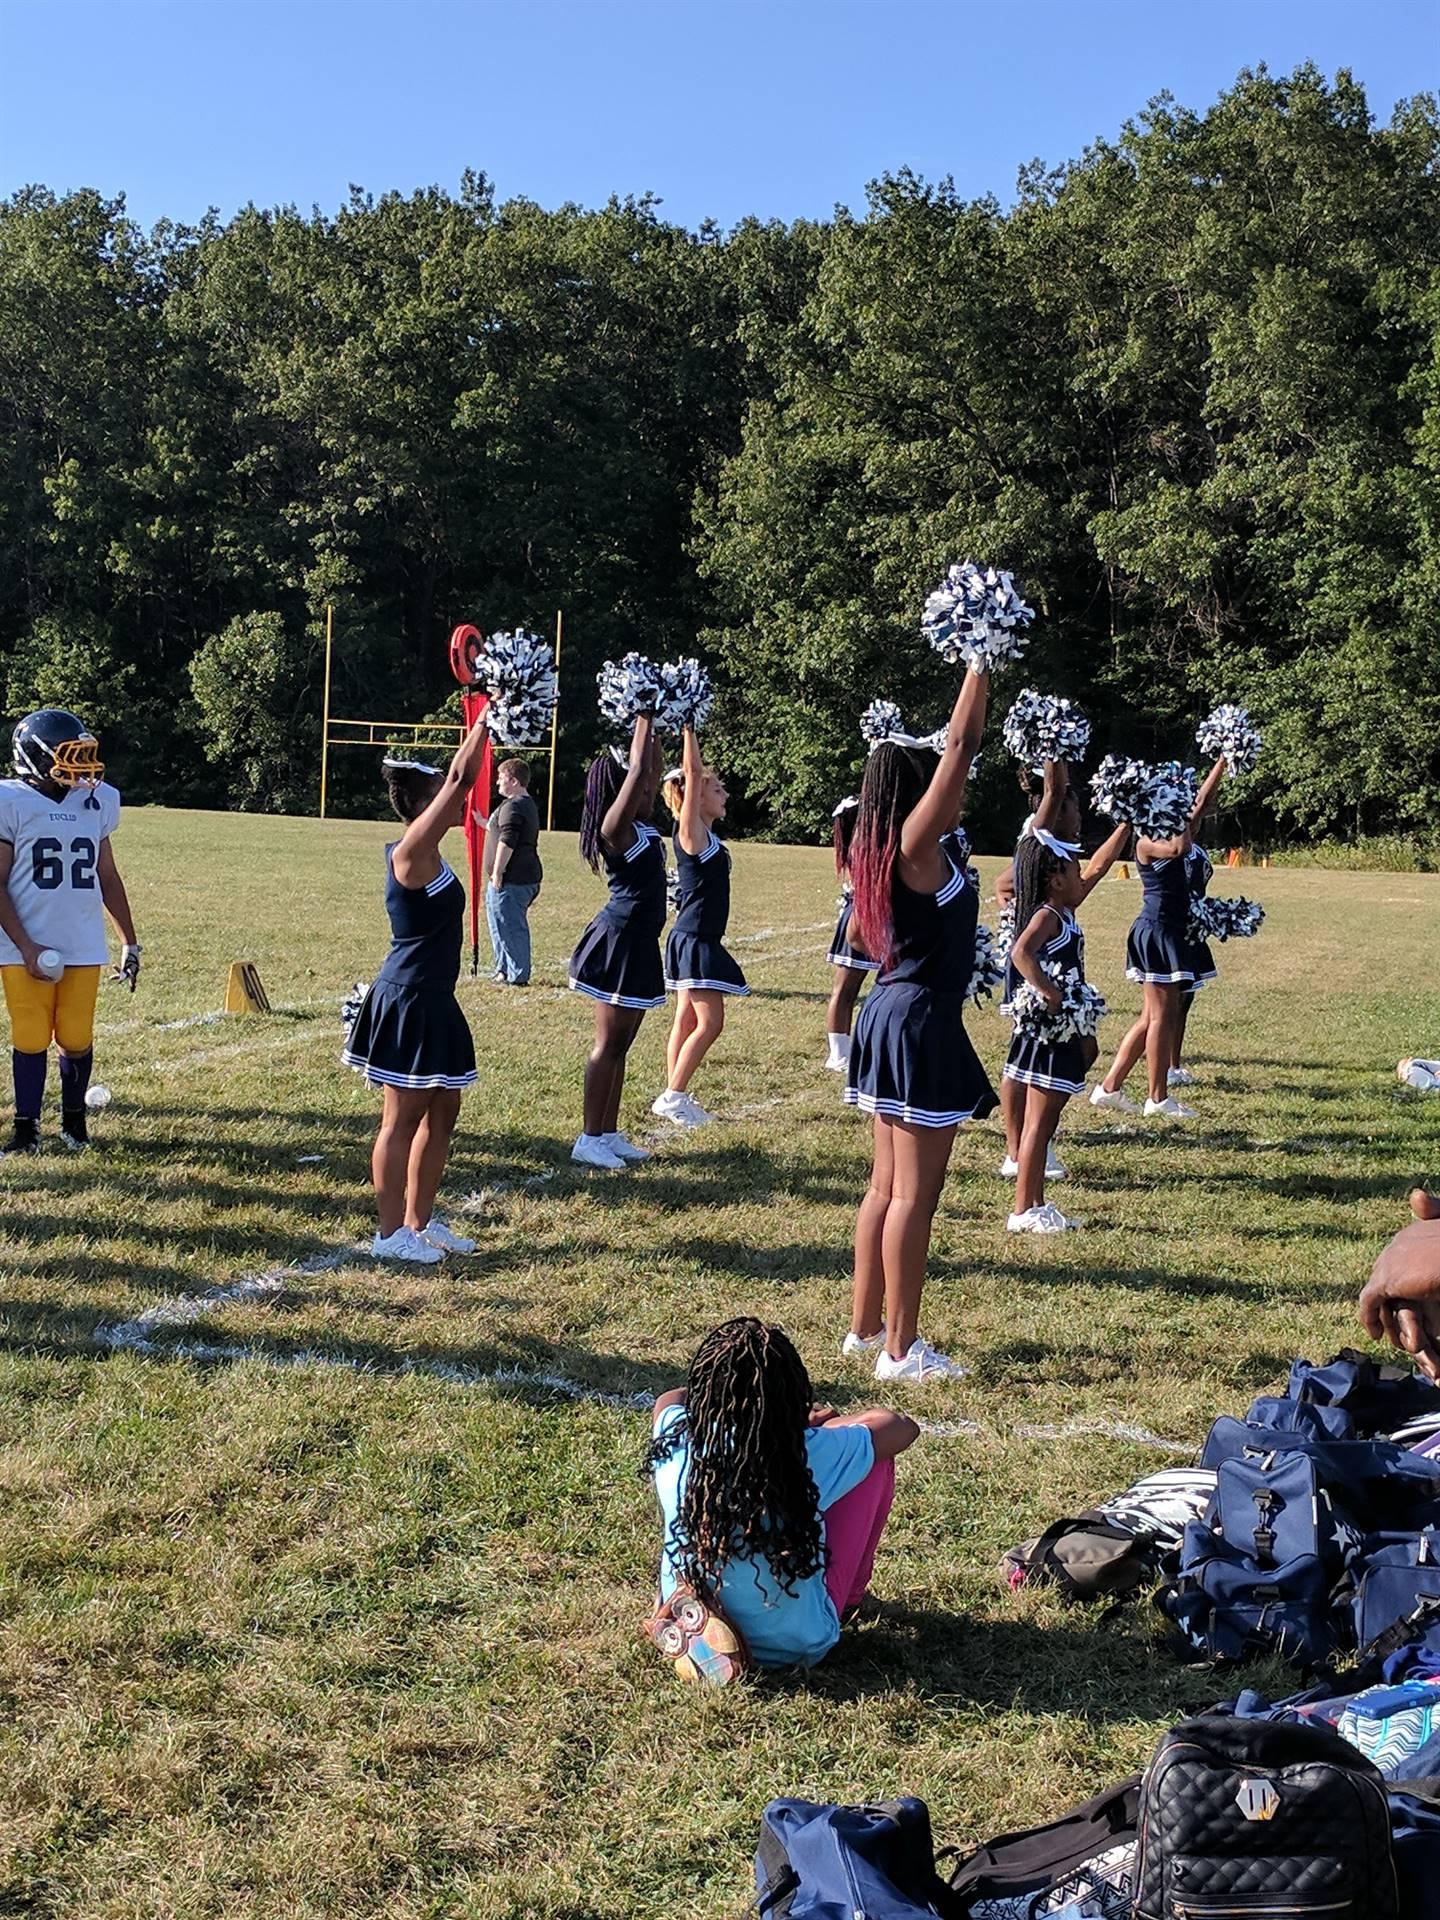 Cheerleaders at the football game